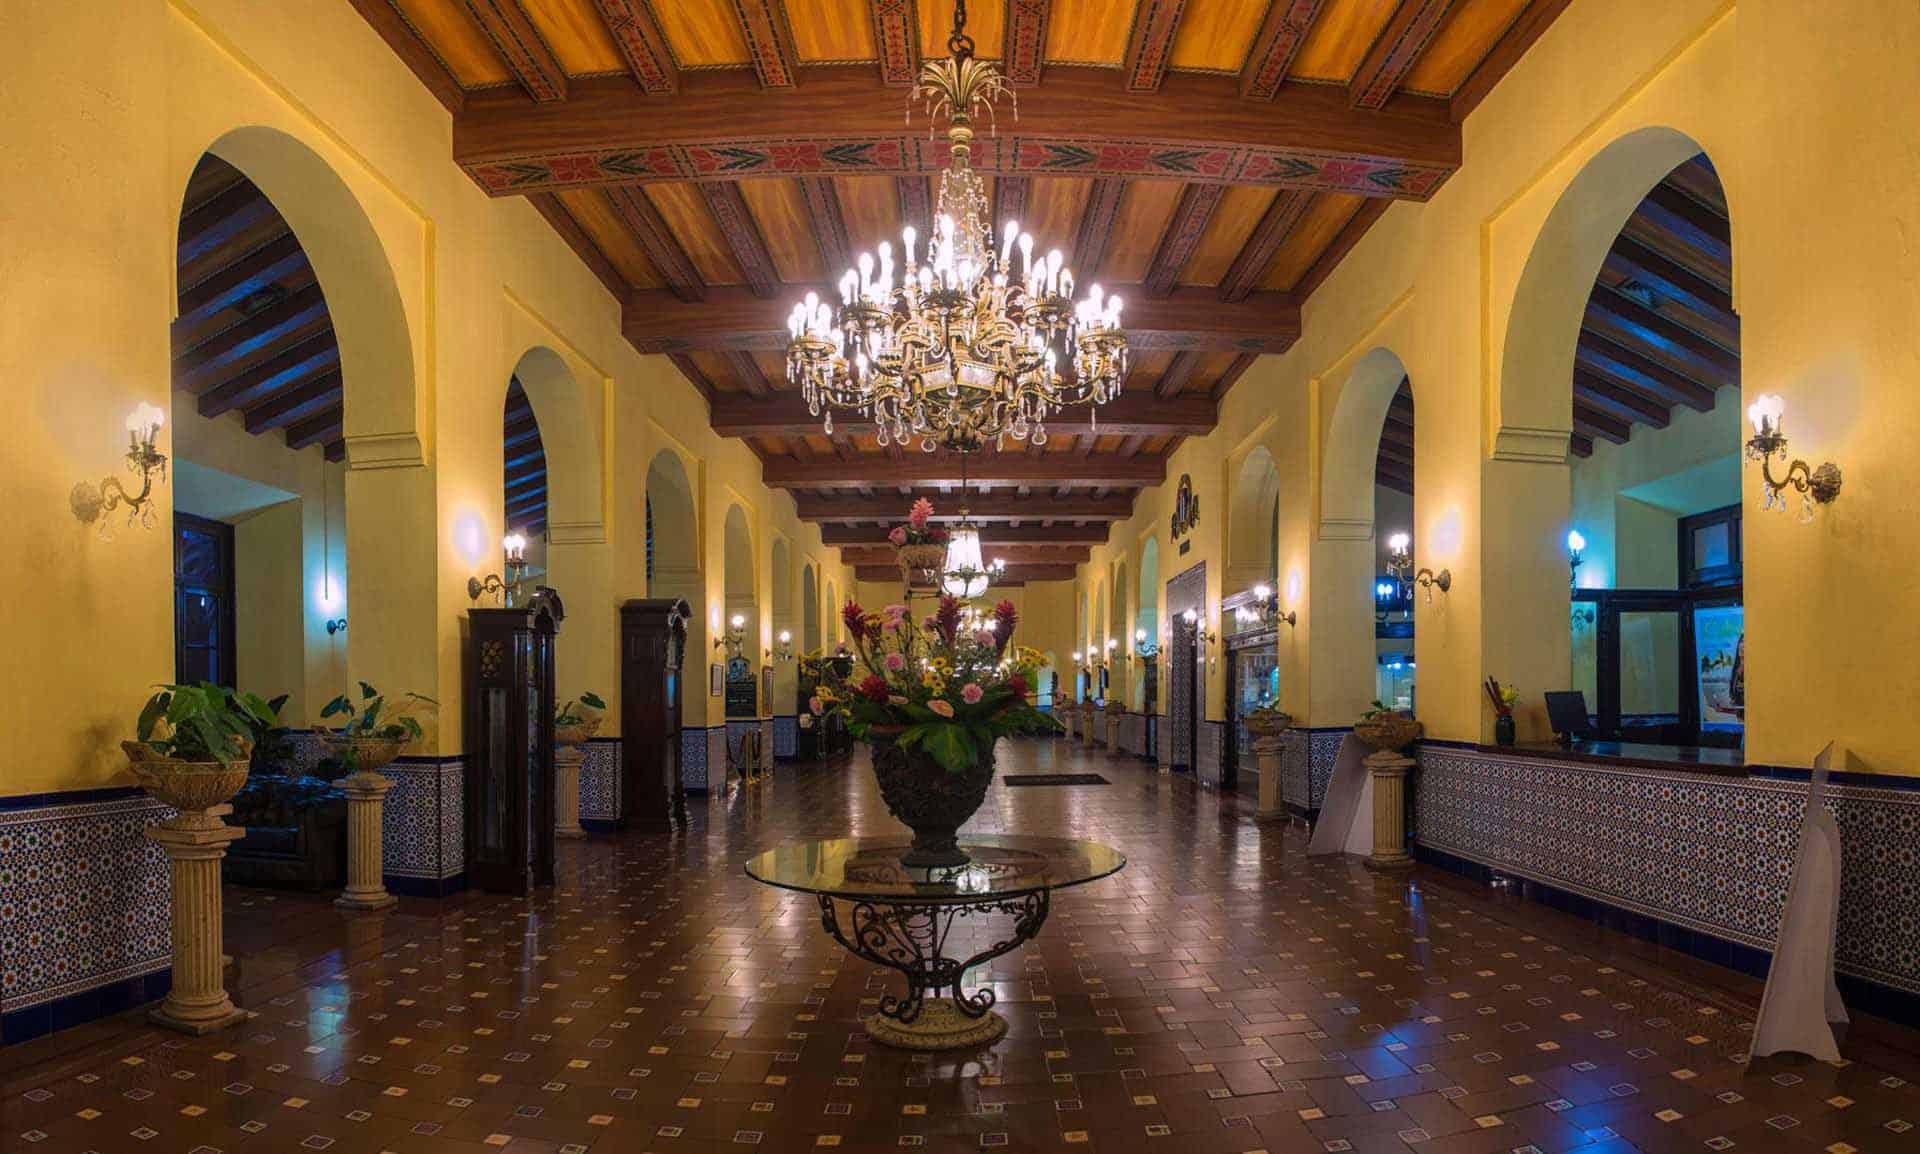 H3061 Hotel Nacional 06 cuba autrement